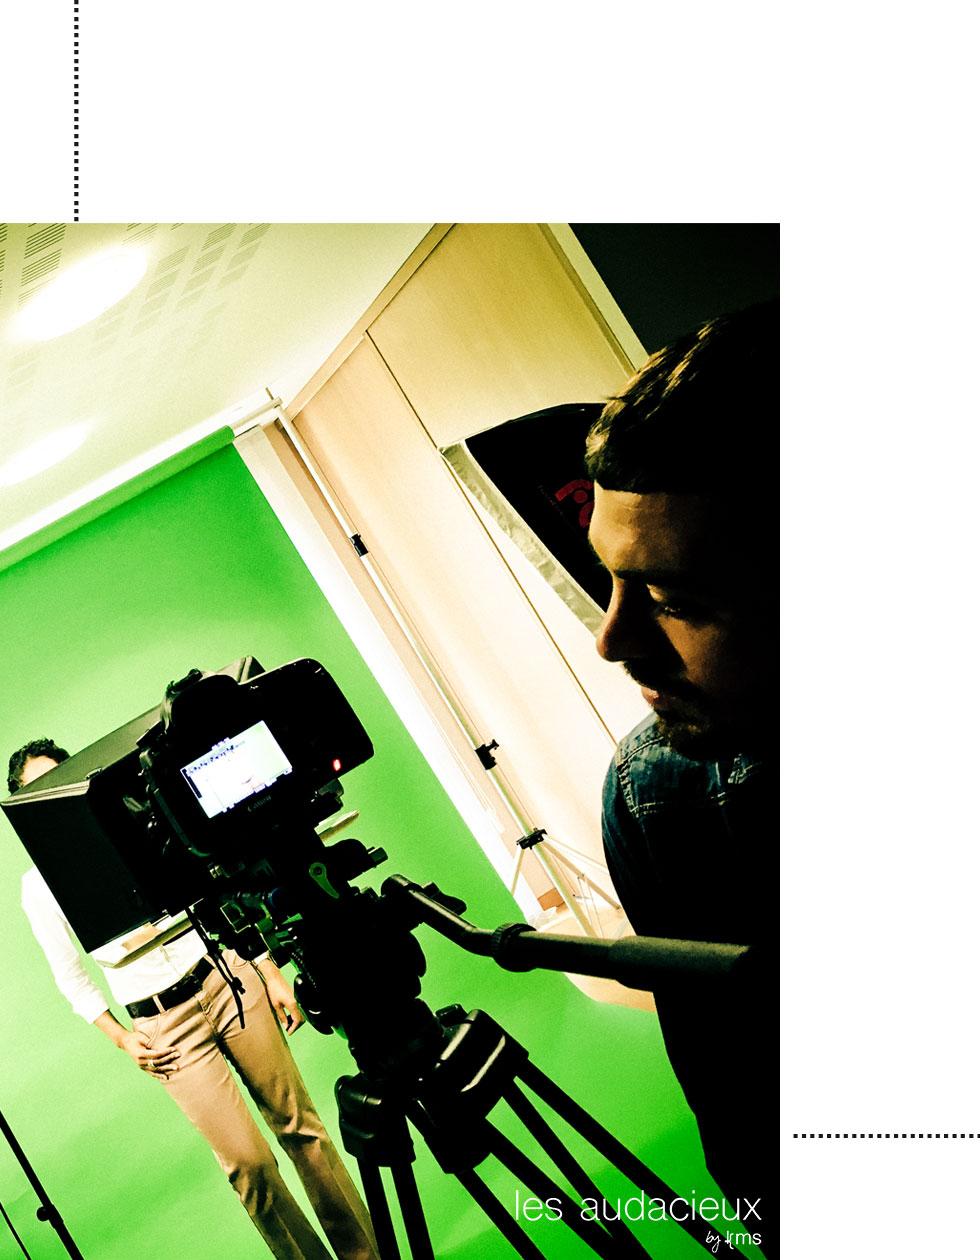 CV vidéo - photo kms communication #lesaudacieux